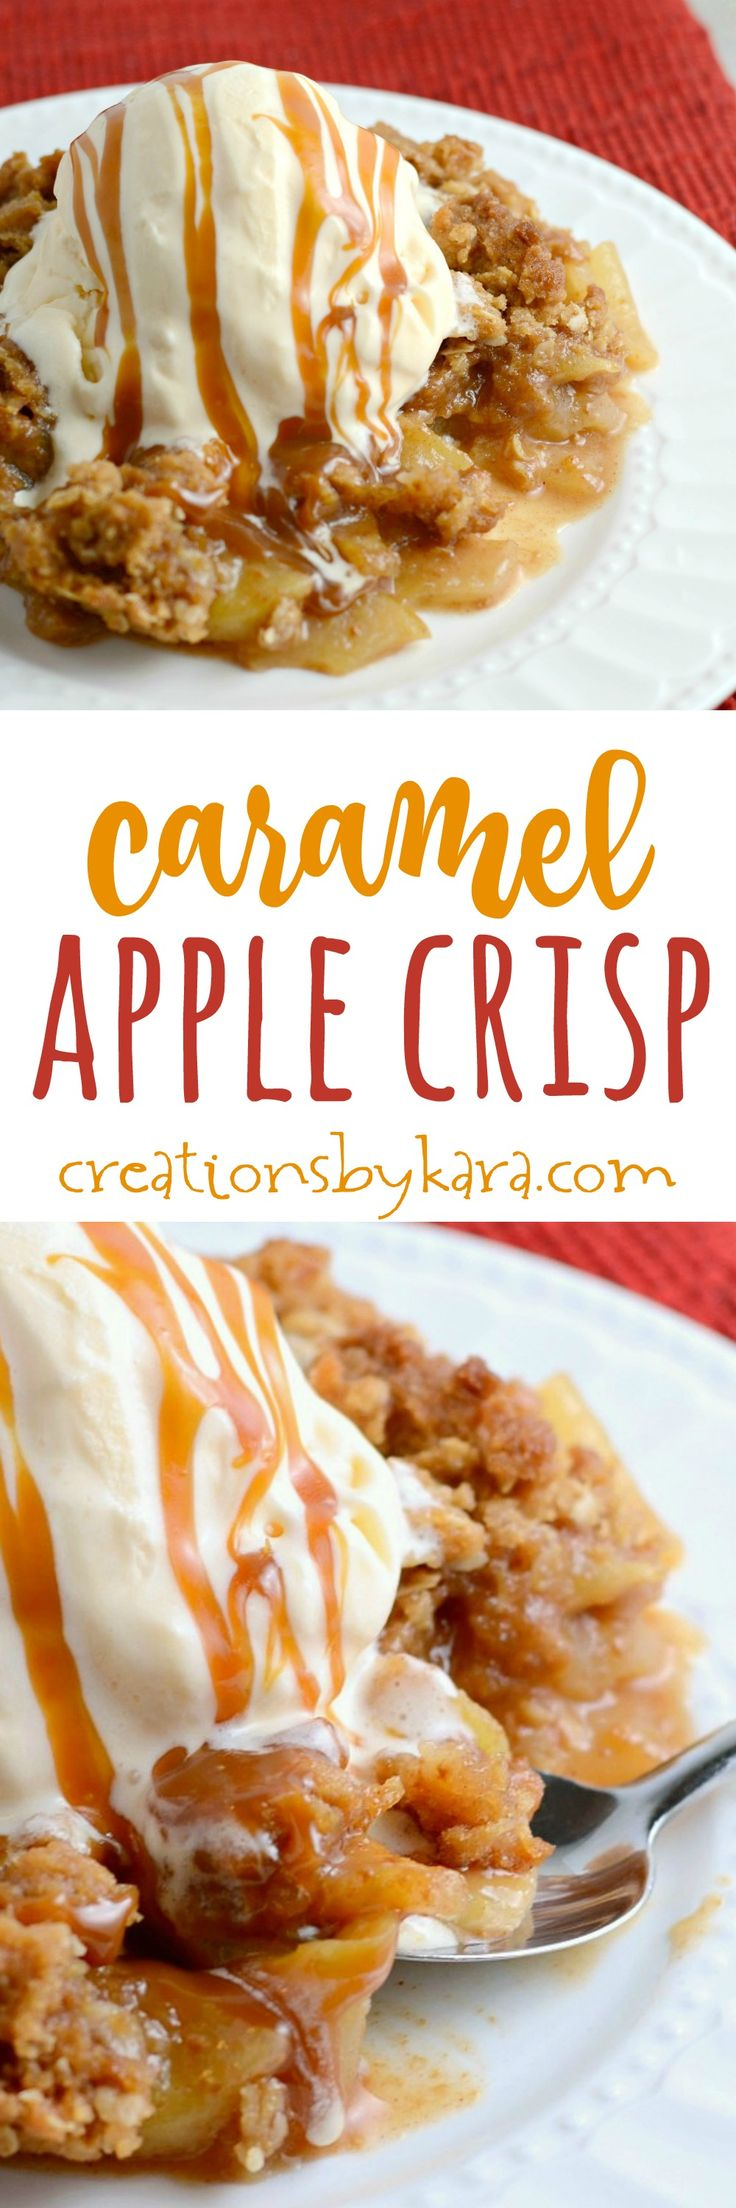 This Caramel Apple Crisp recipe is extra decadent and delicious ...